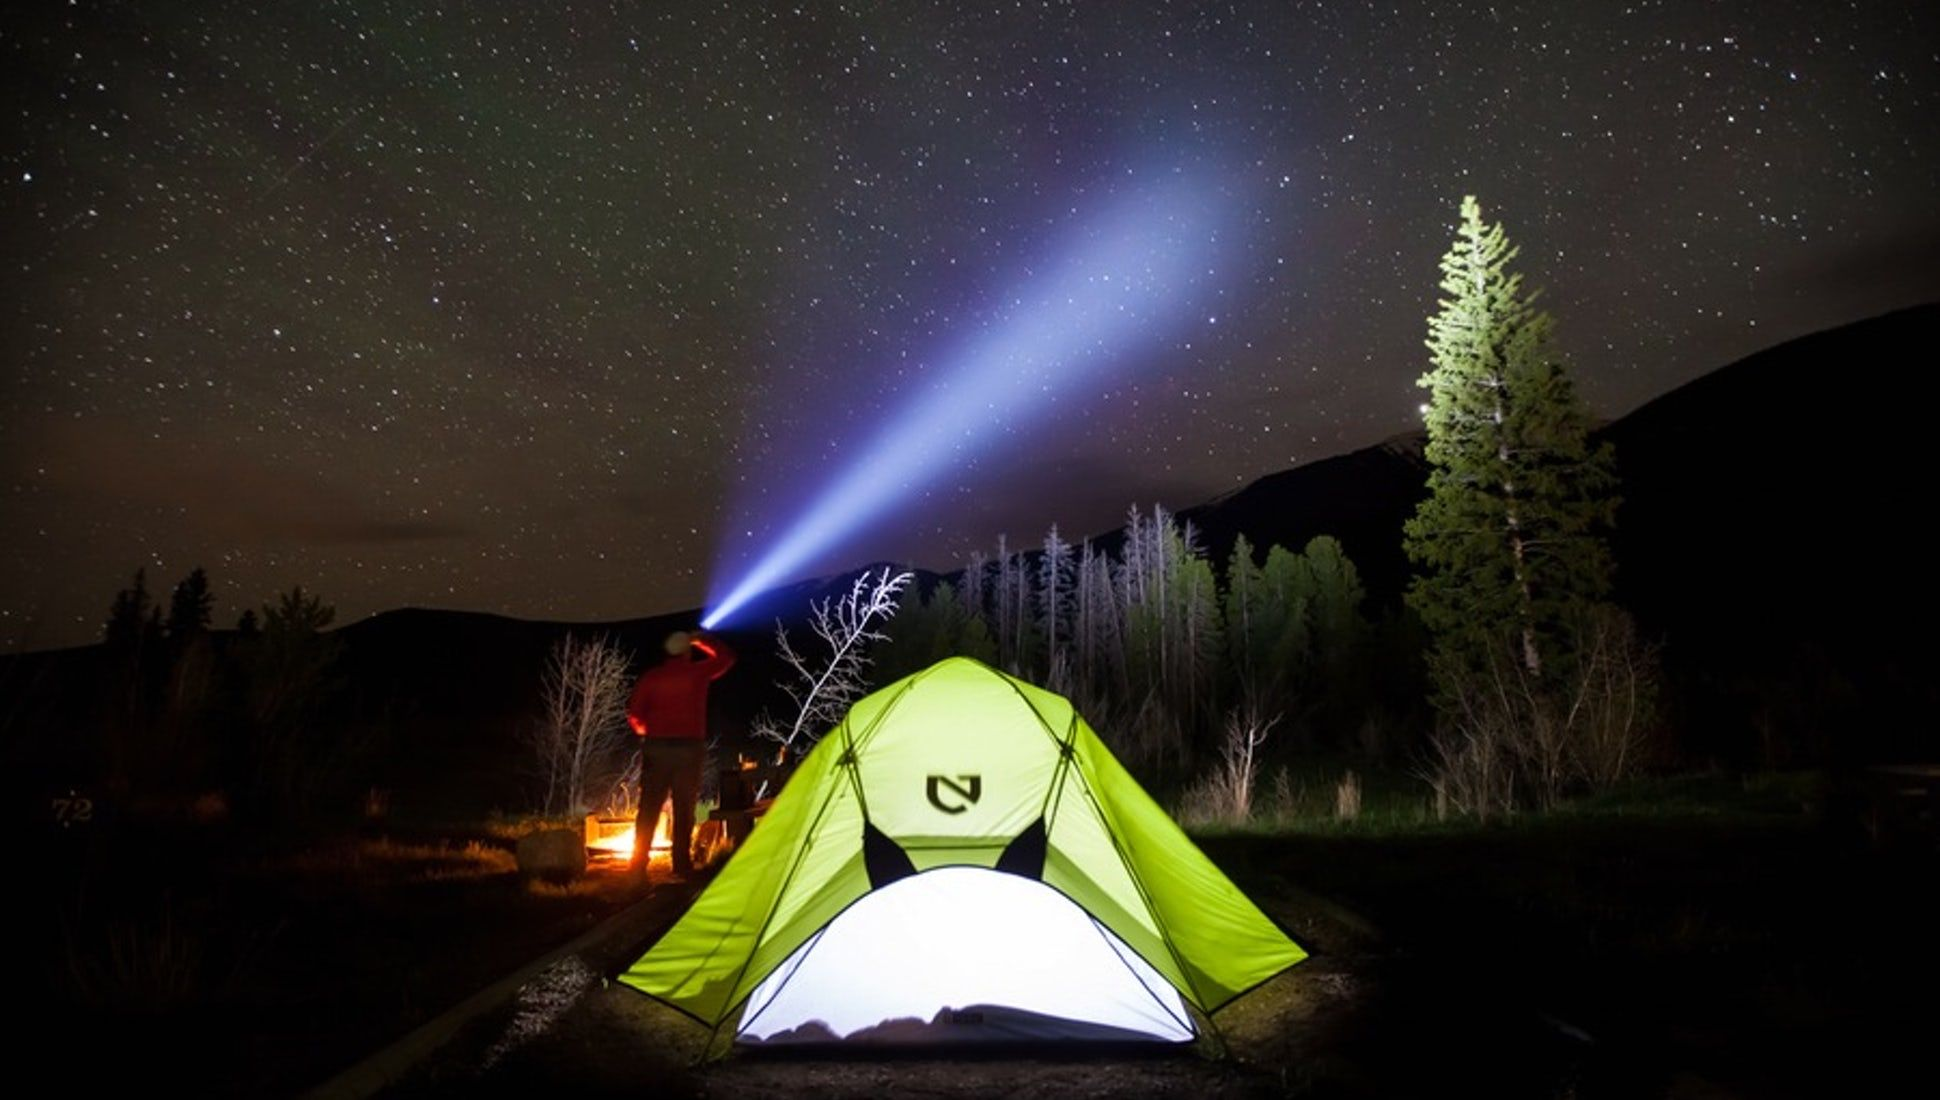 Top 5 Car Camping Spots In Colorado's Front Range